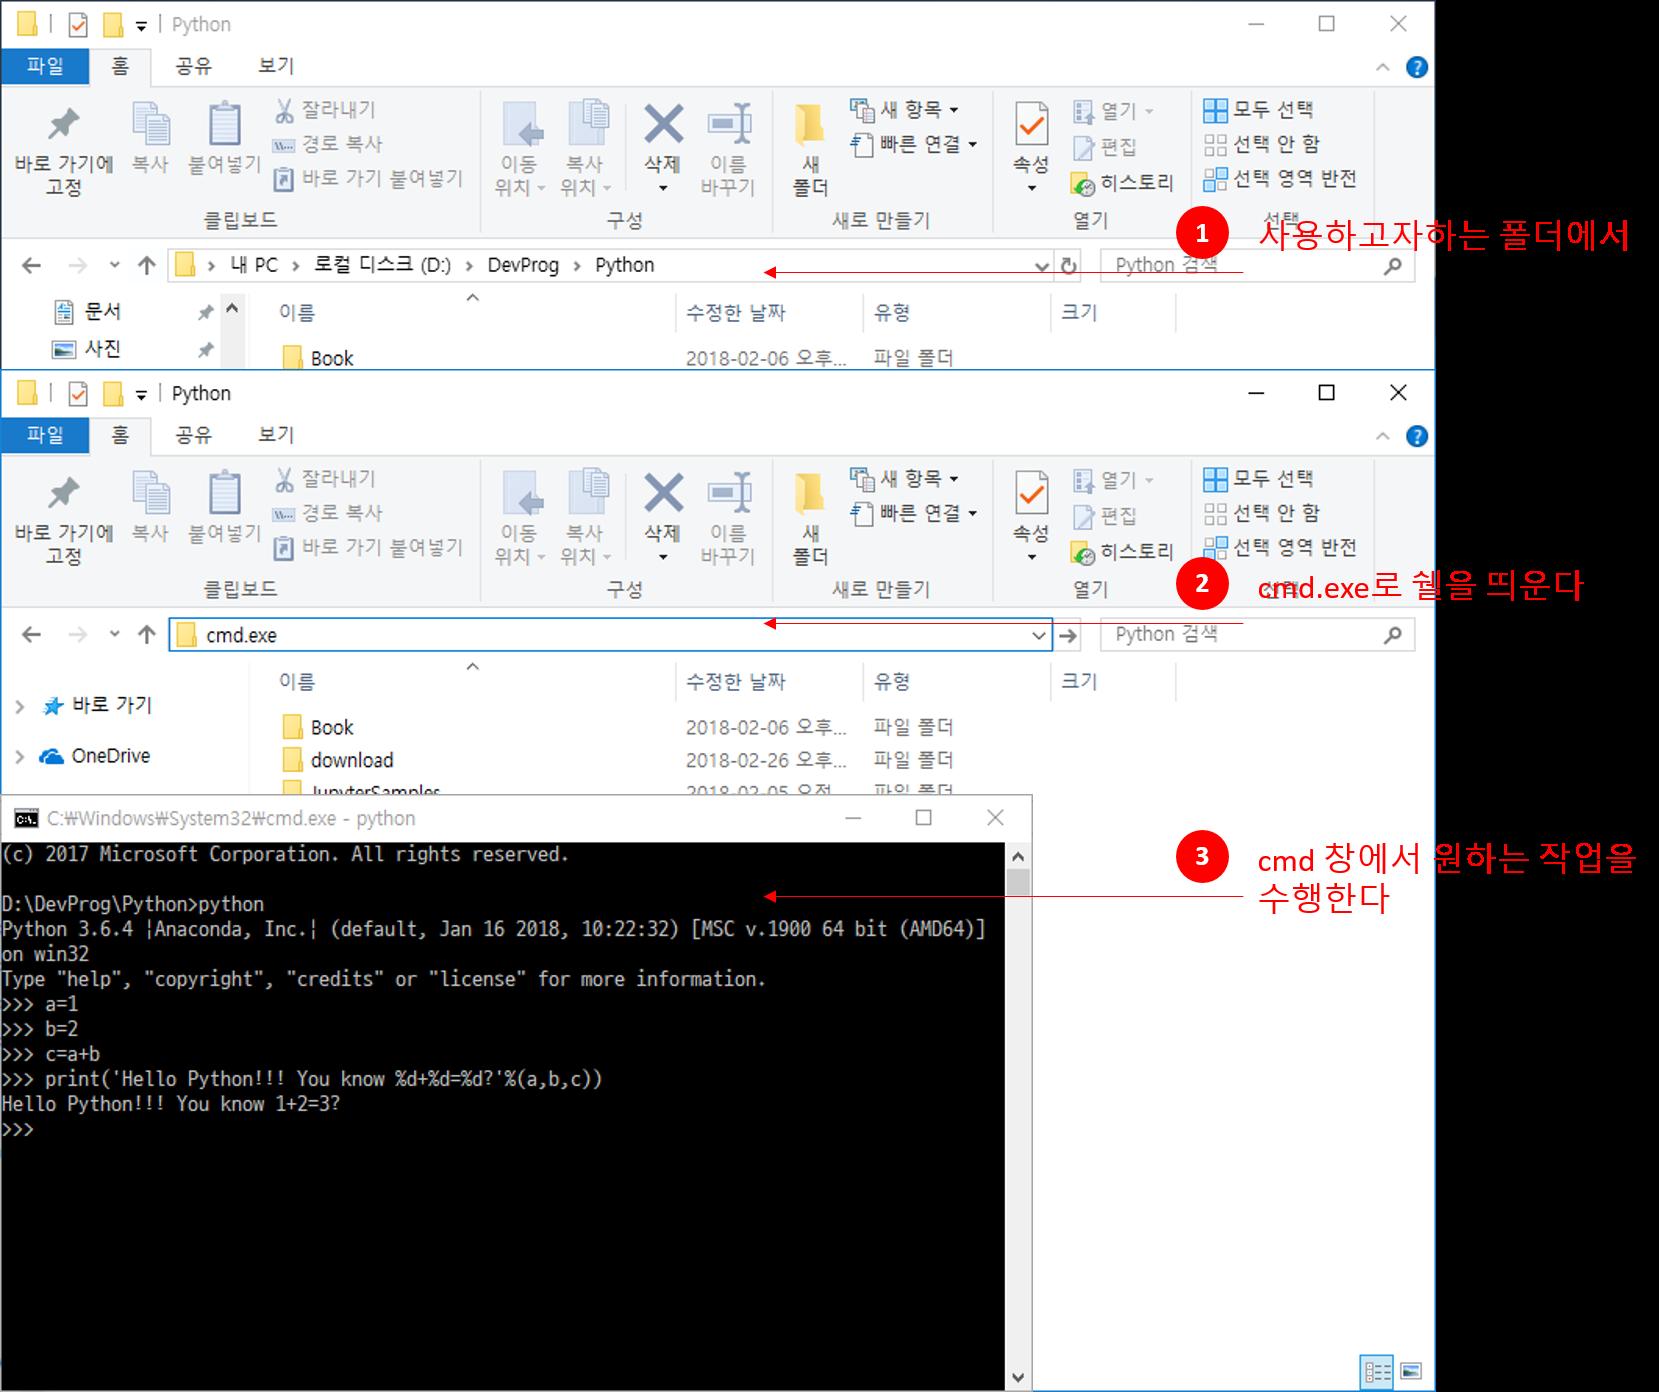 1 1 Python 설치와 구동 - 공학자를 위한 Python